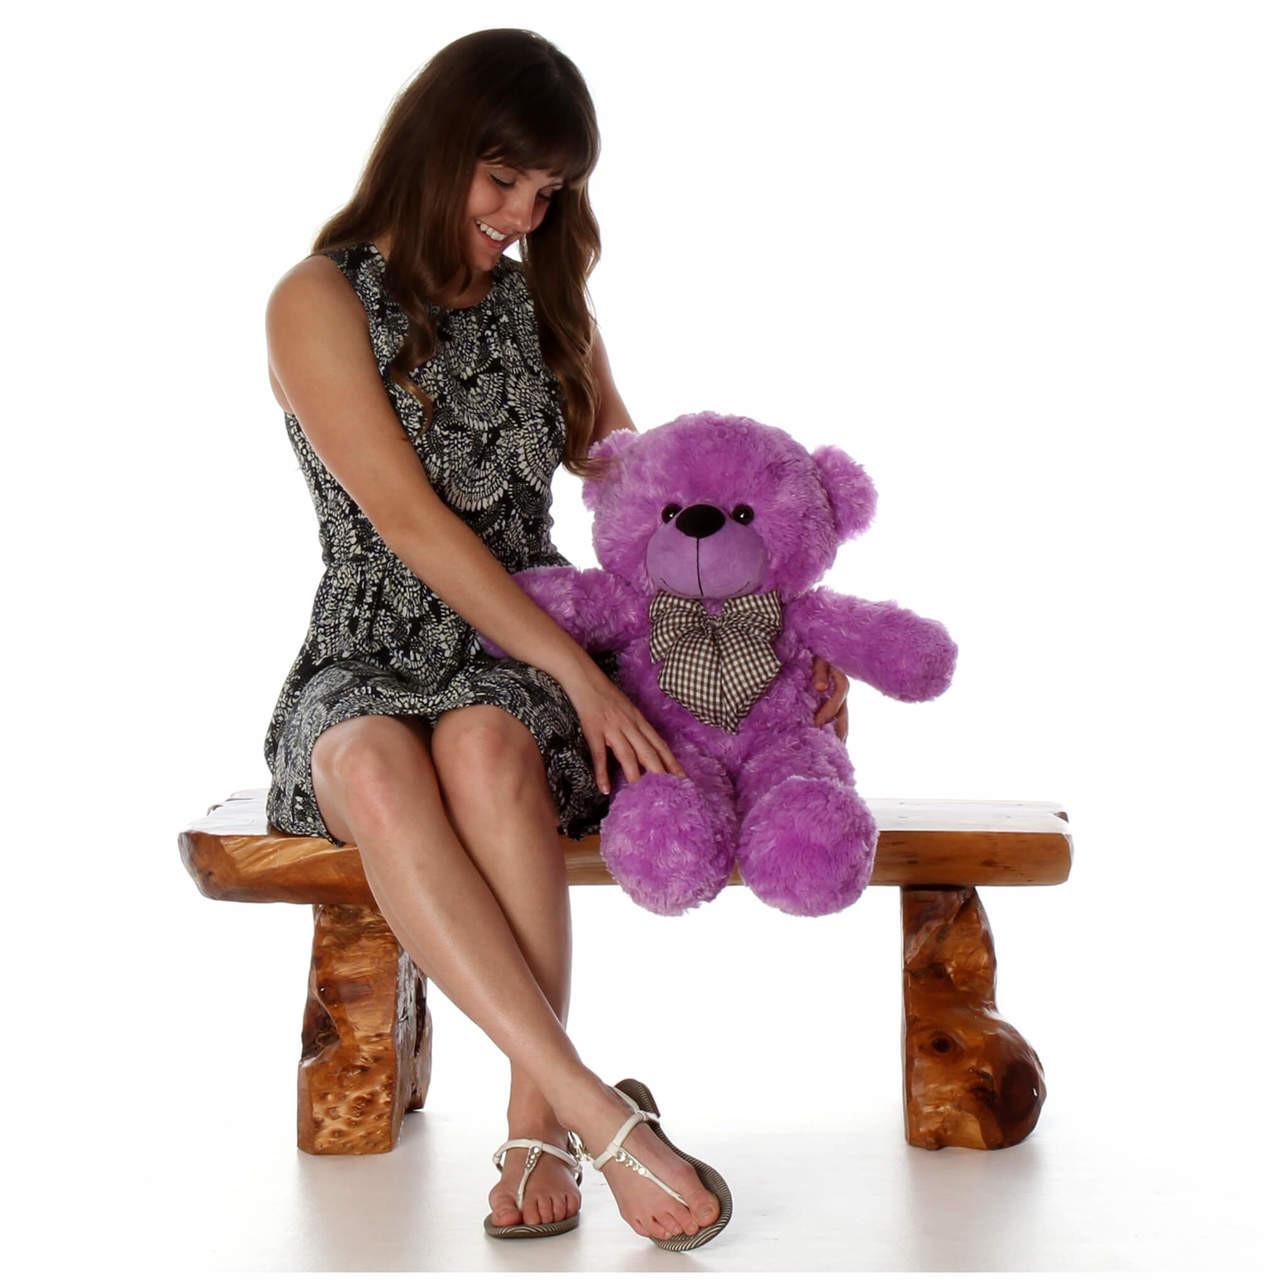 DeeDee Cuddles Adorable Lavender Purple Plush Teddy Bear 30 inch